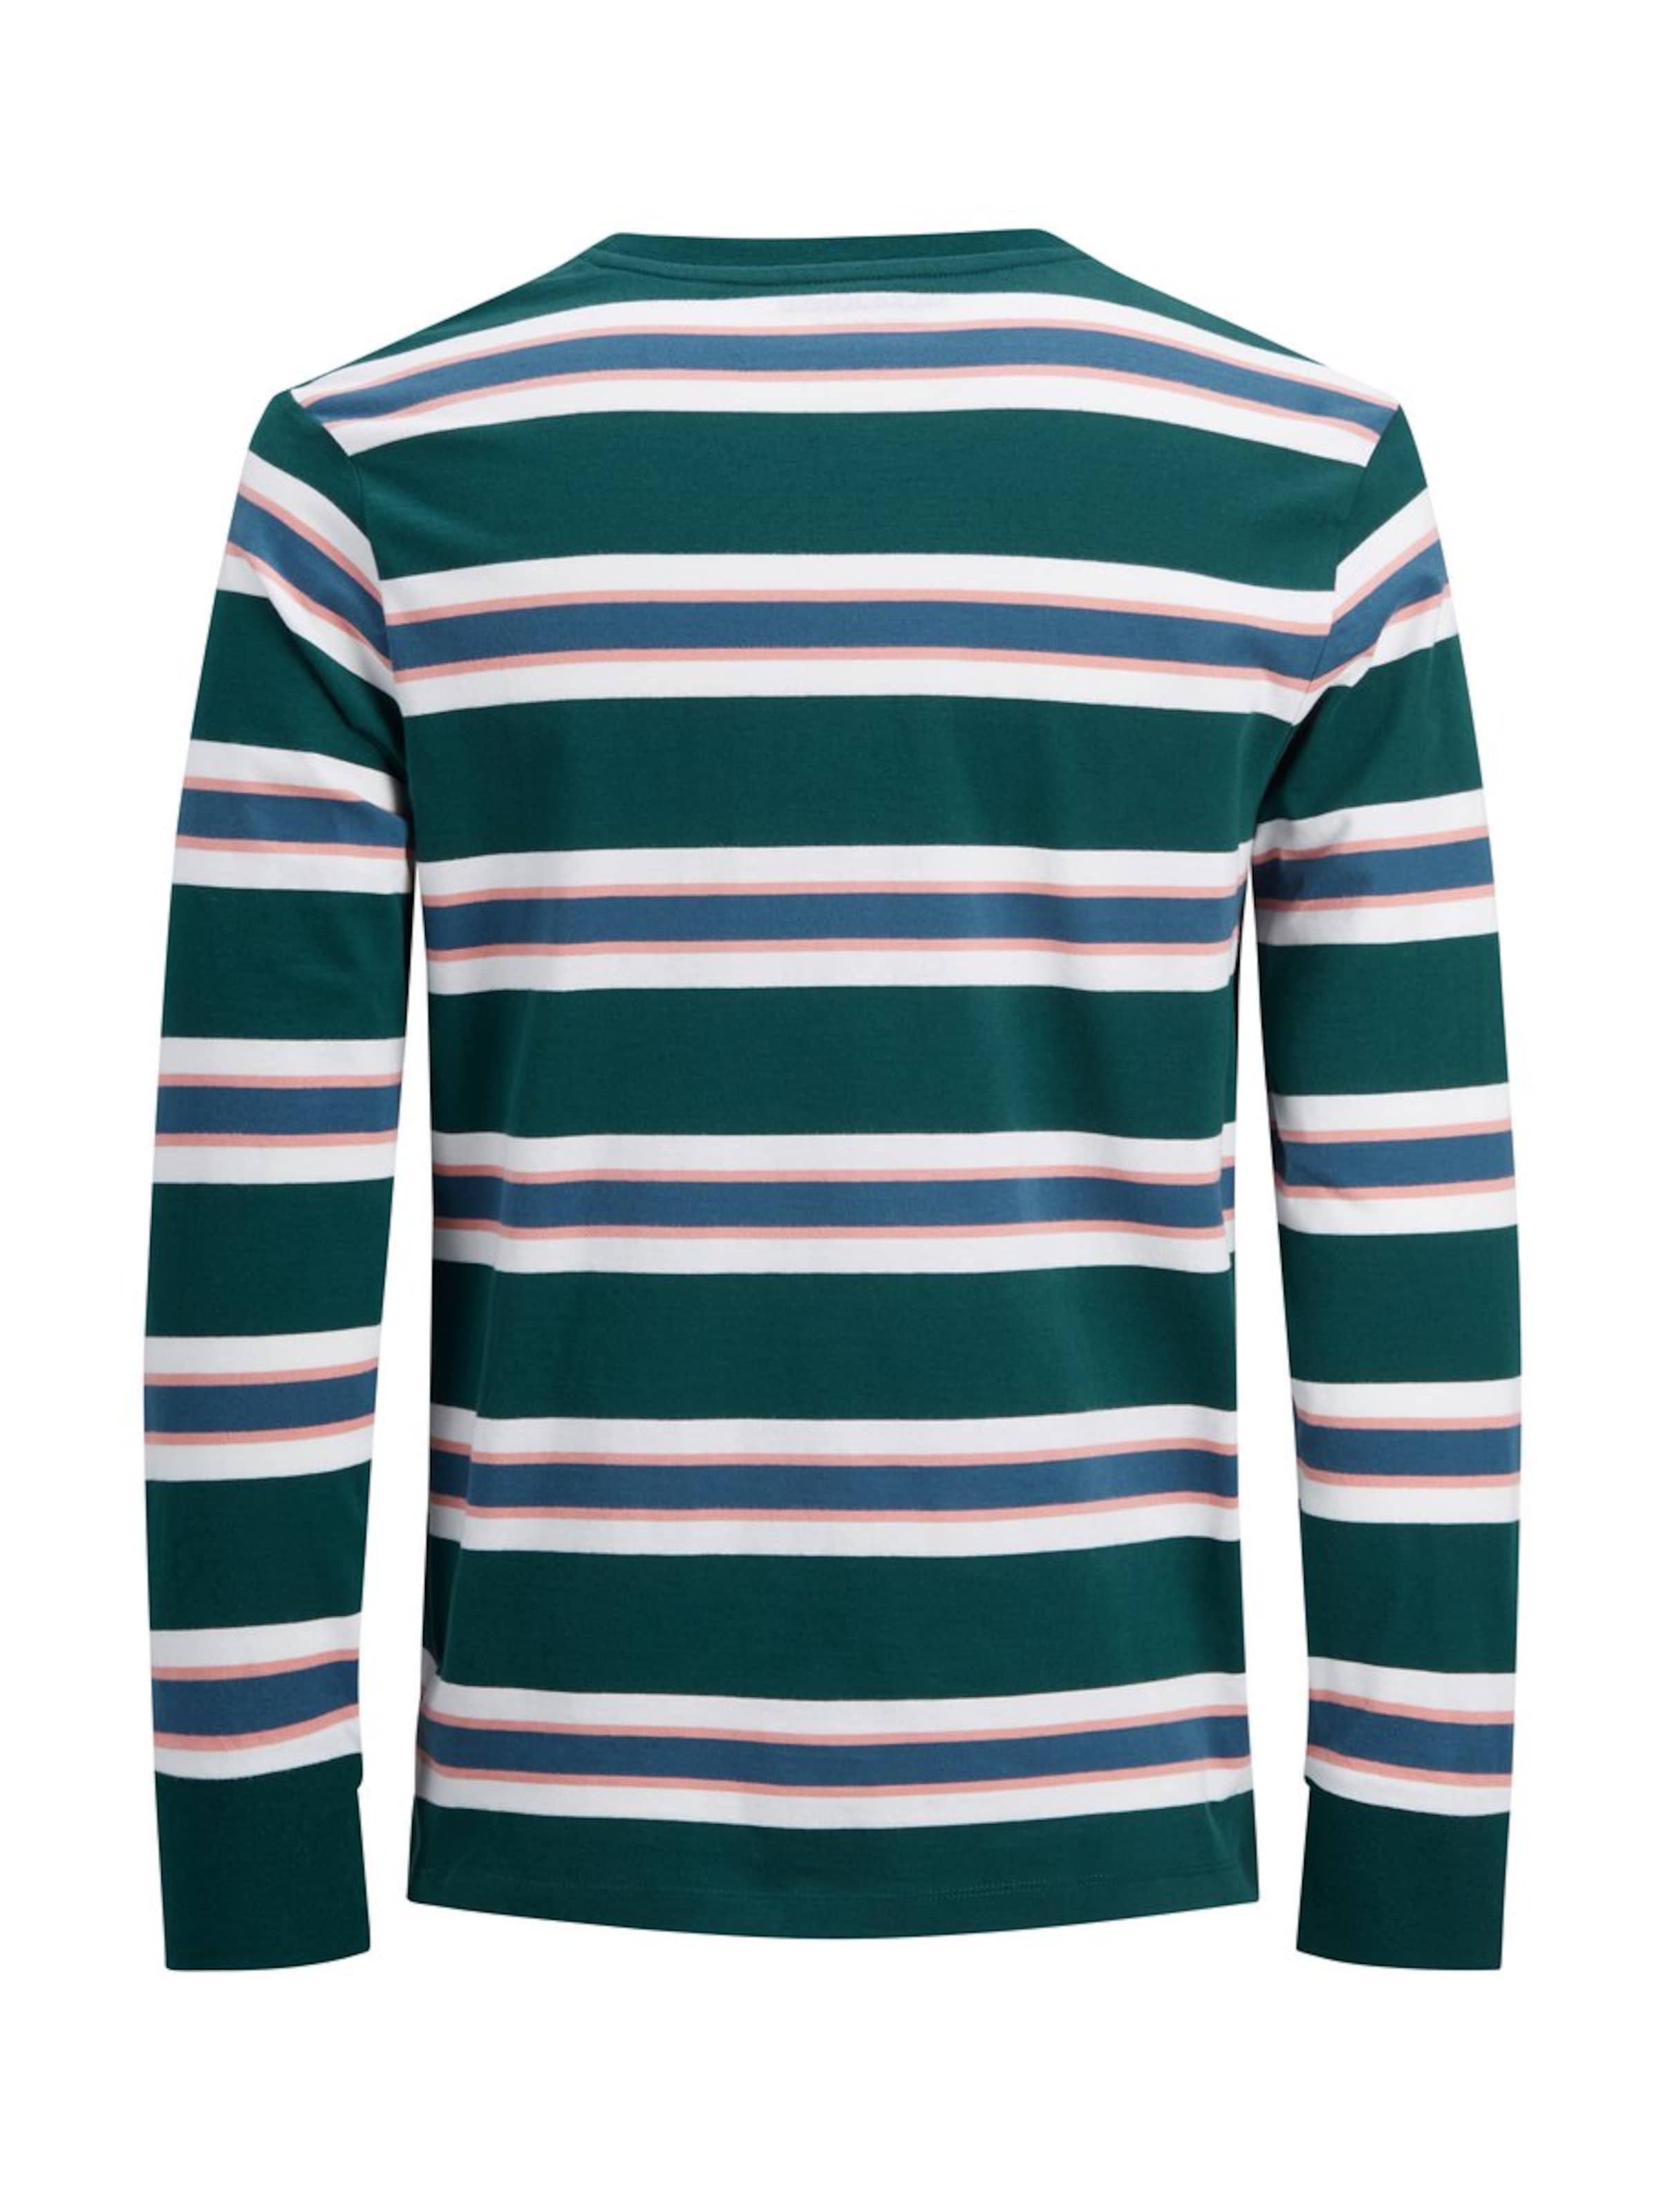 PétroleSapin T En shirt Blanc Jackamp; Jones Pêche uJl1TKFc3